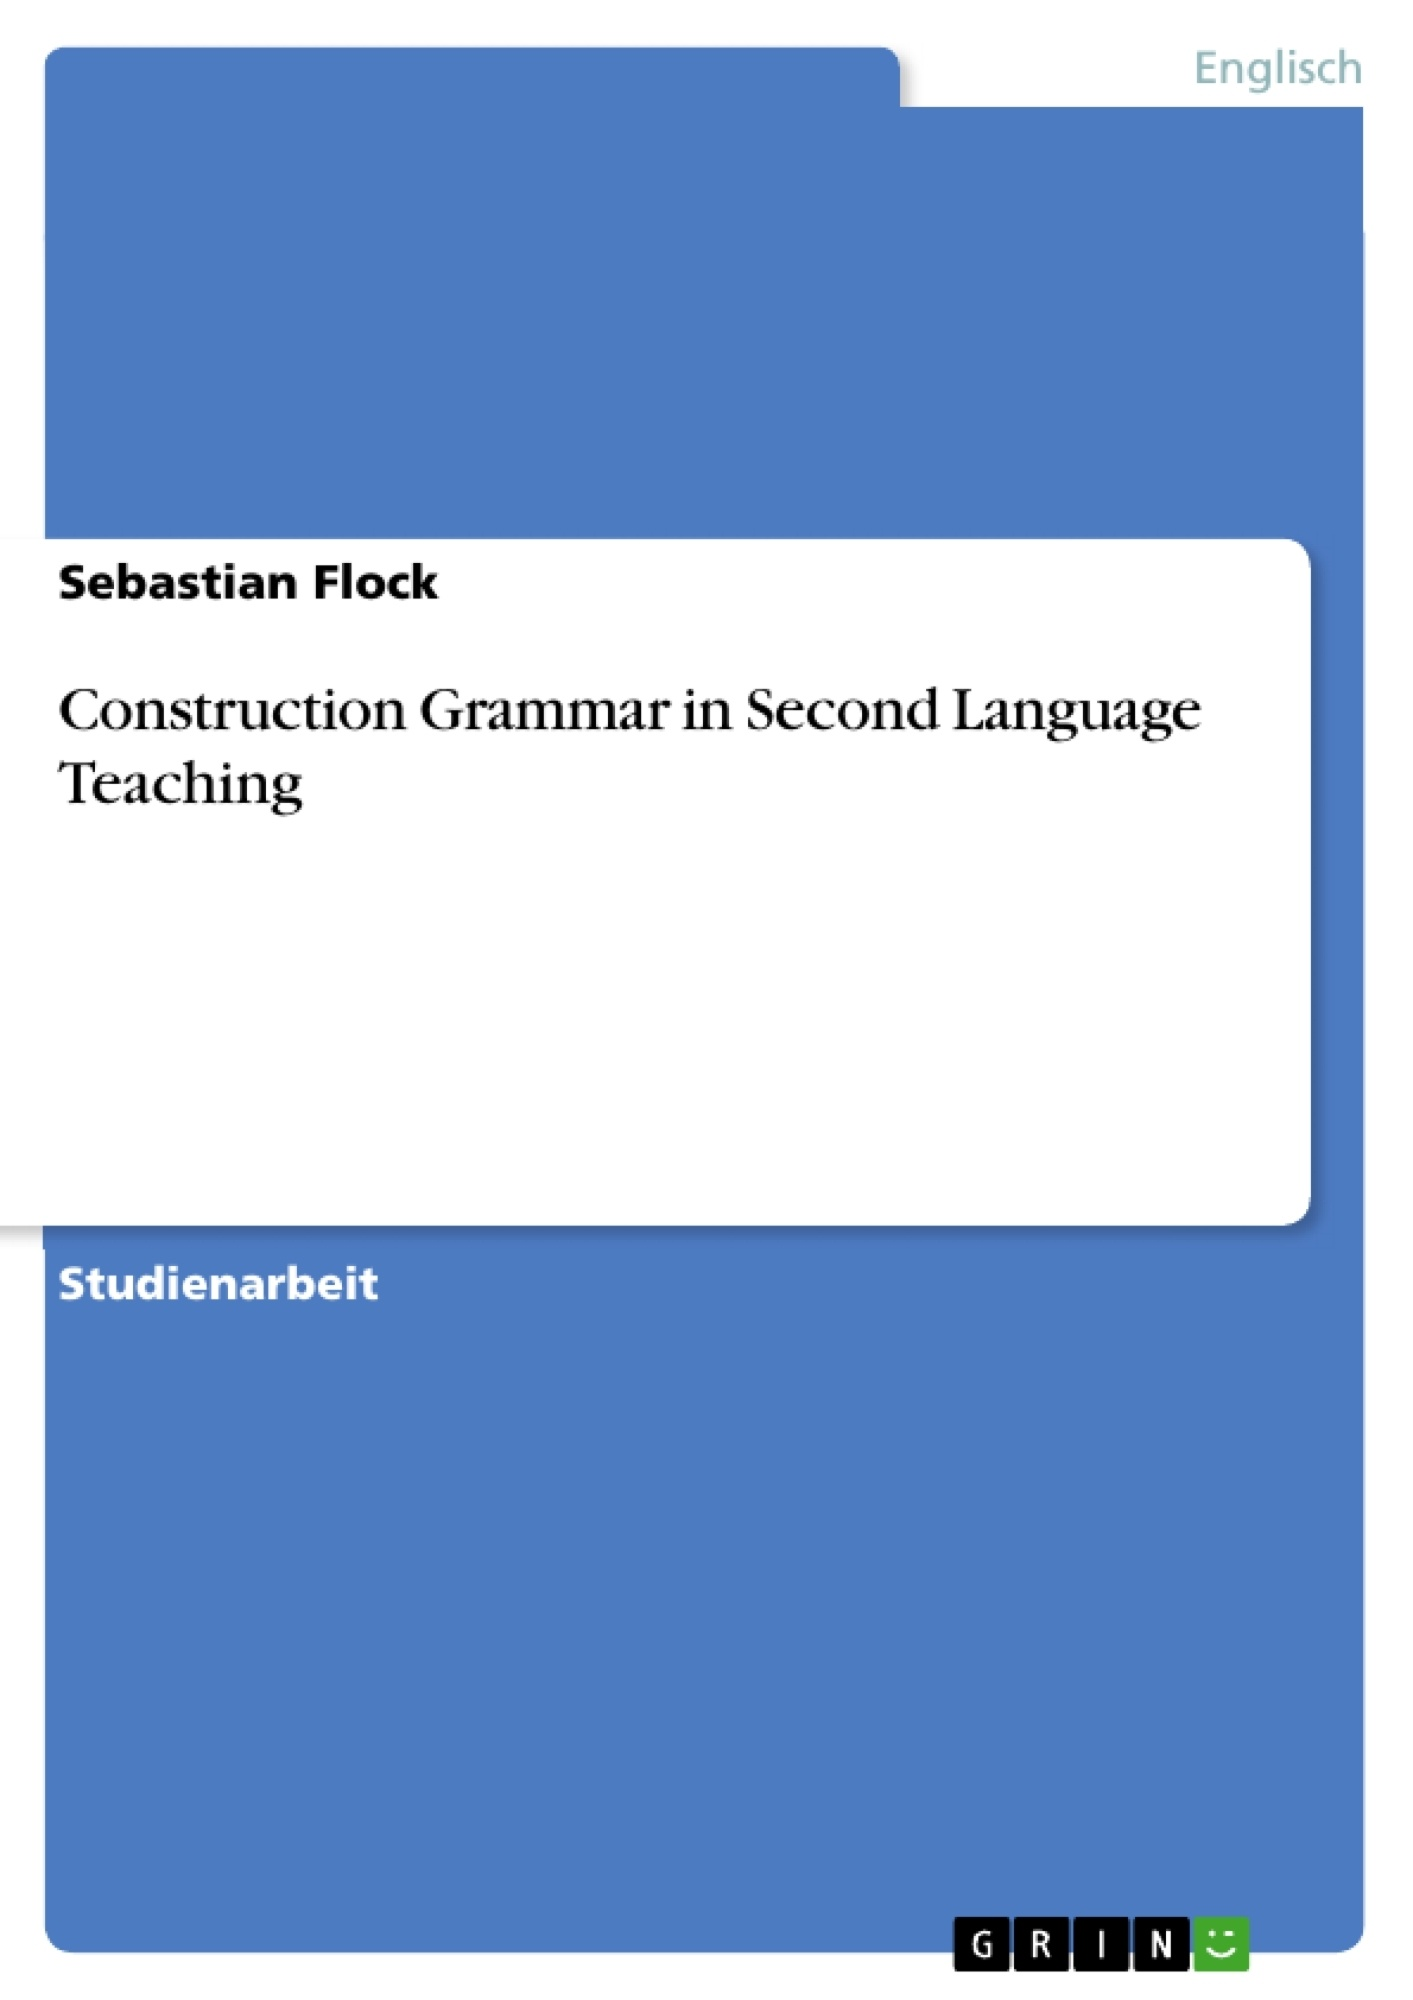 Titel: Construction Grammar in Second Language Teaching